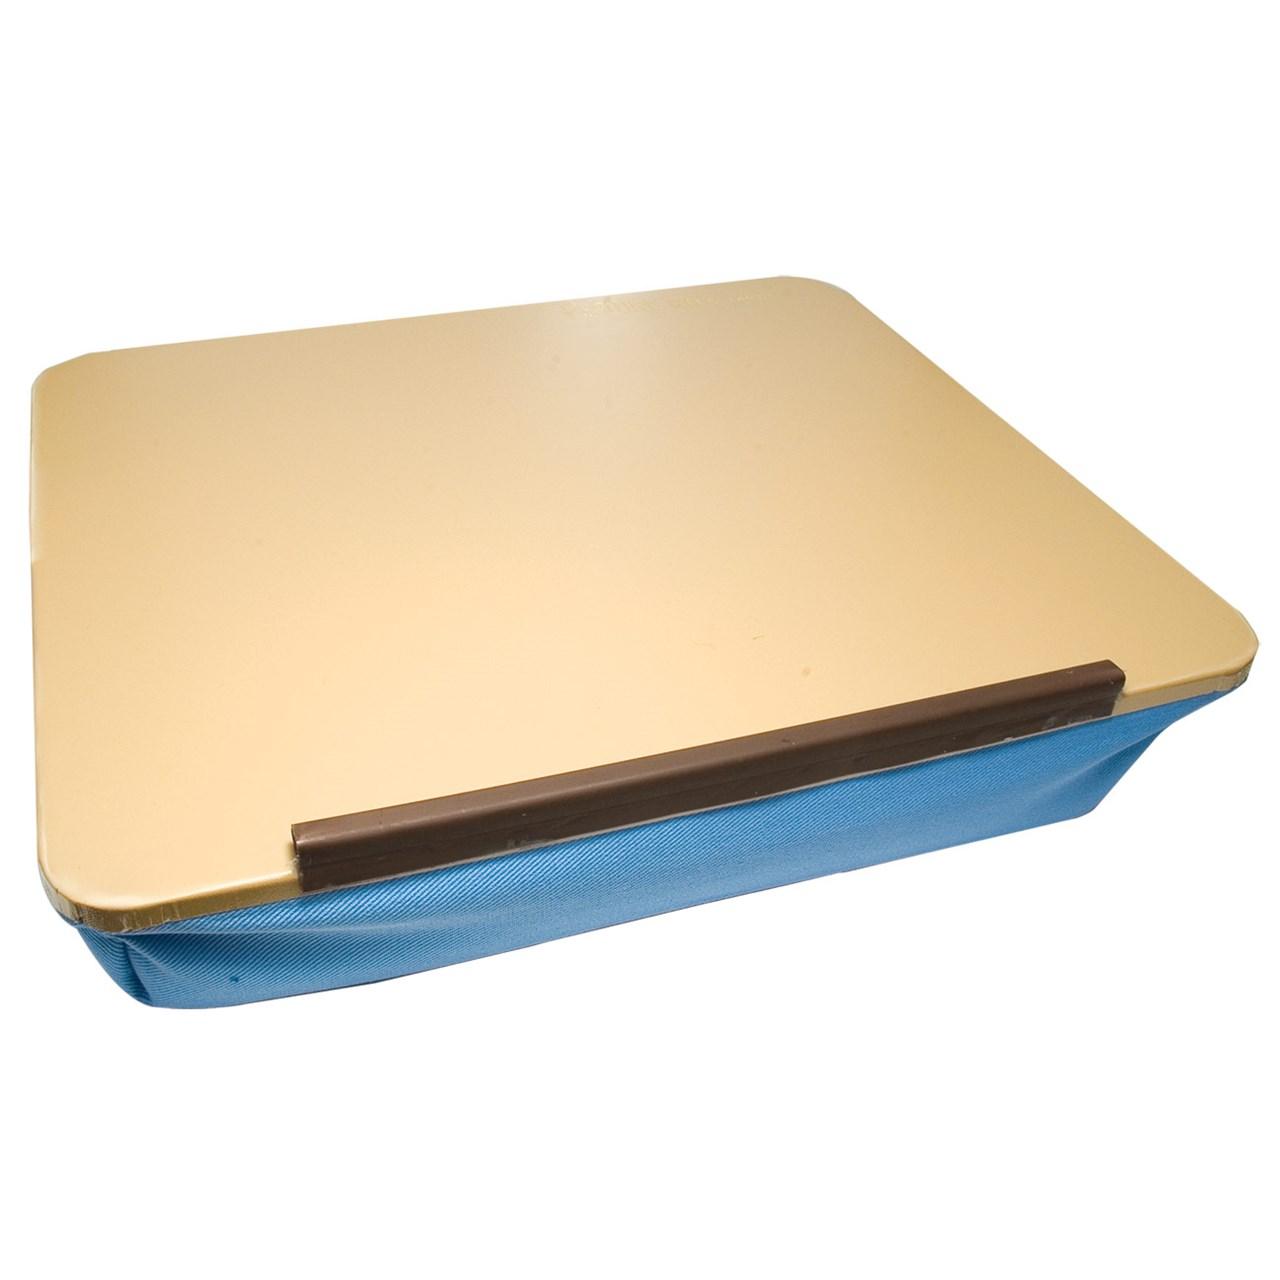 MaxiAids | Posture-Rite Lap Desk